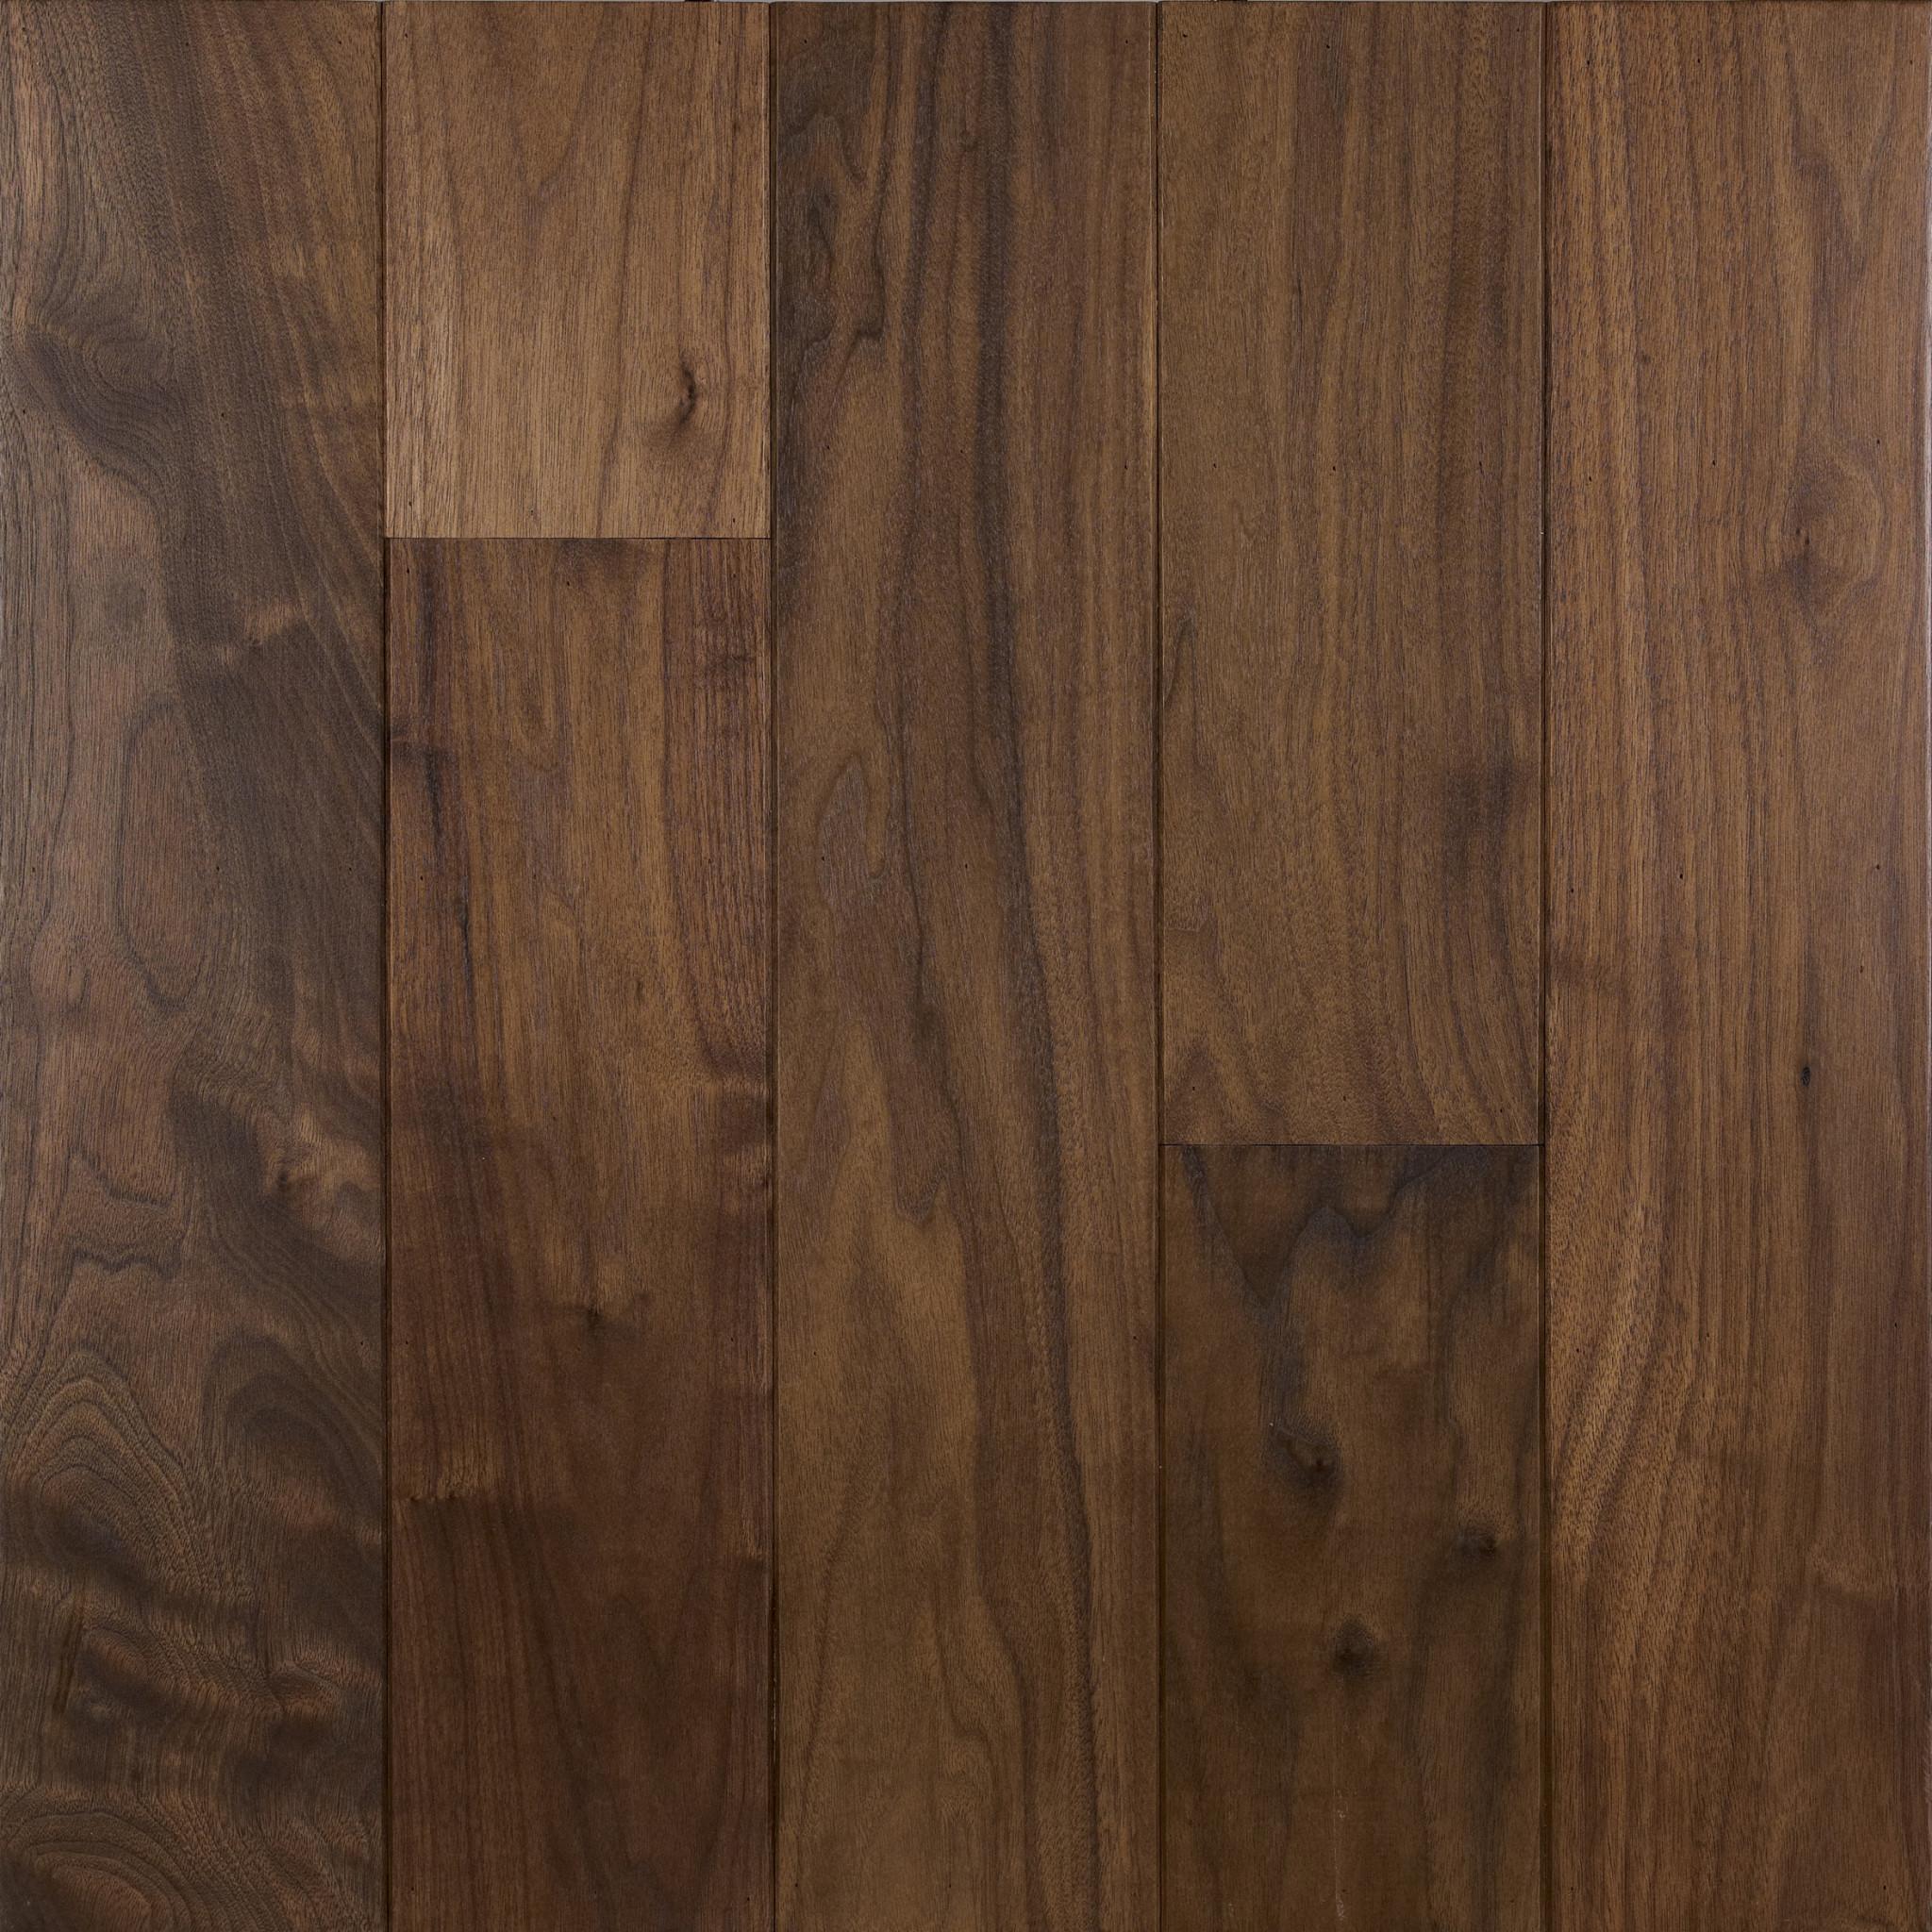 34 x 314 American Walnut Natural Prefinished Wood Floor